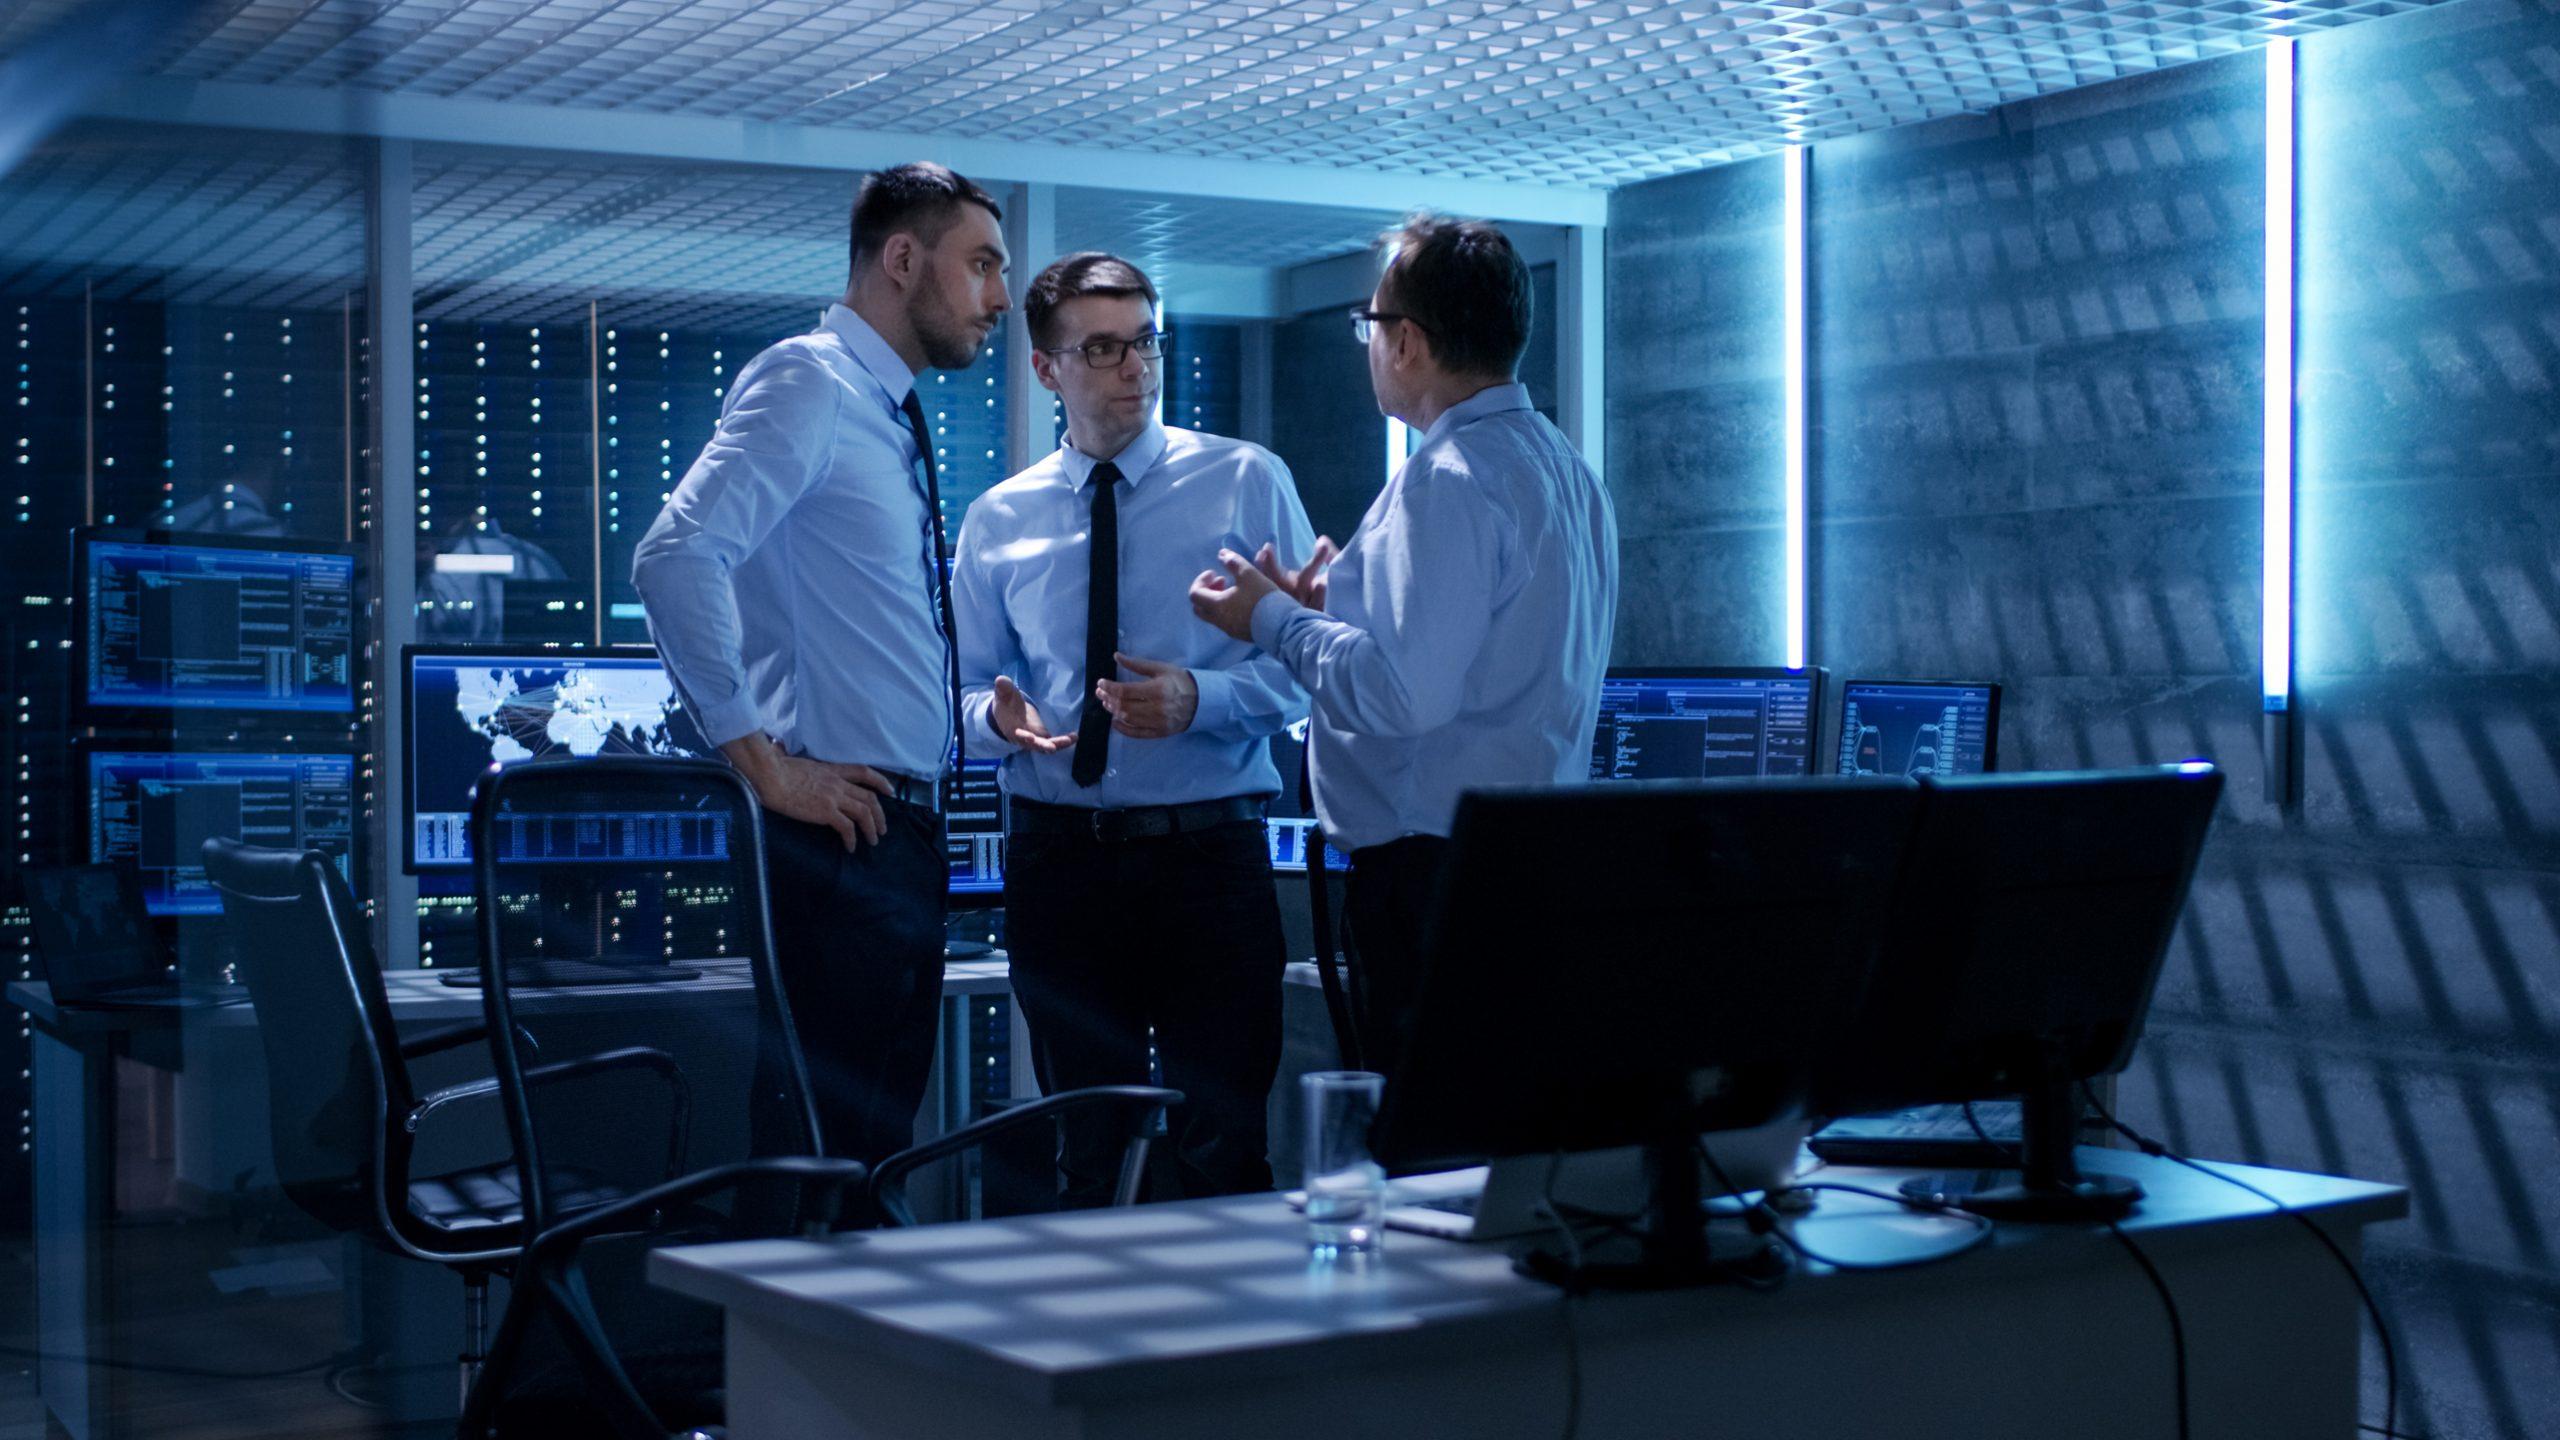 Shield Information Solutions: Complete IT Enterprise Solutions